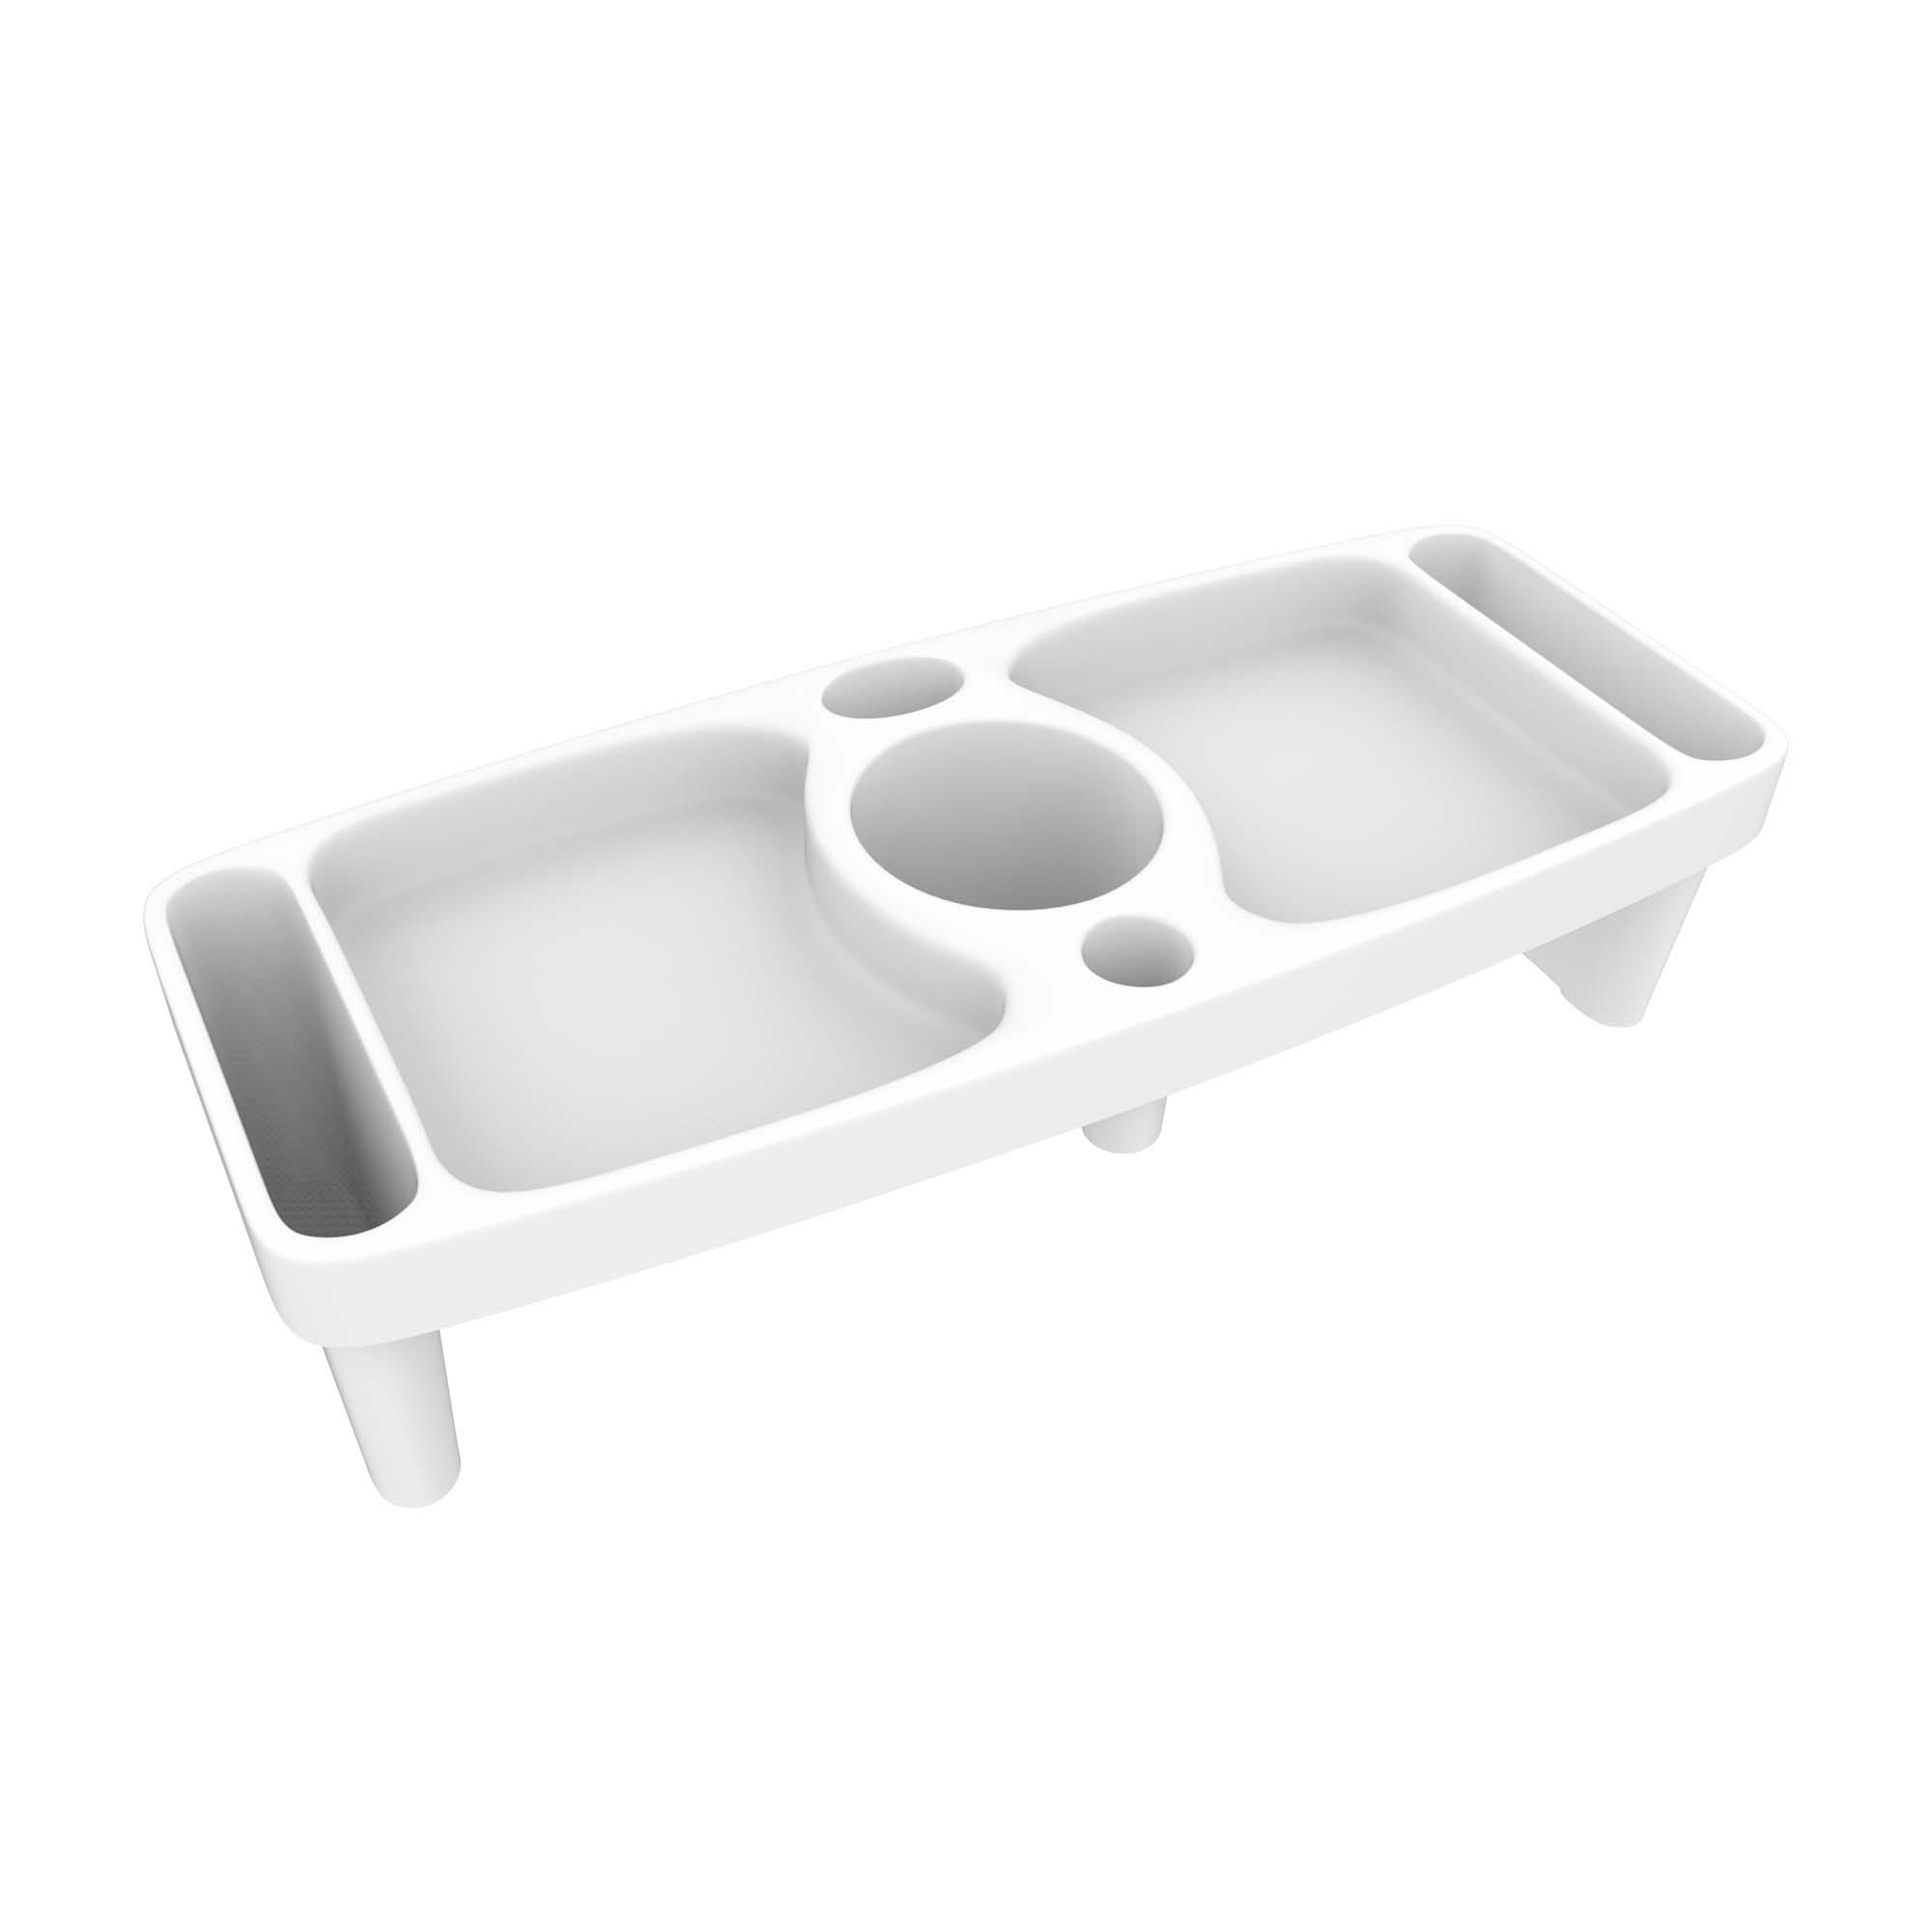 Compact lap tray